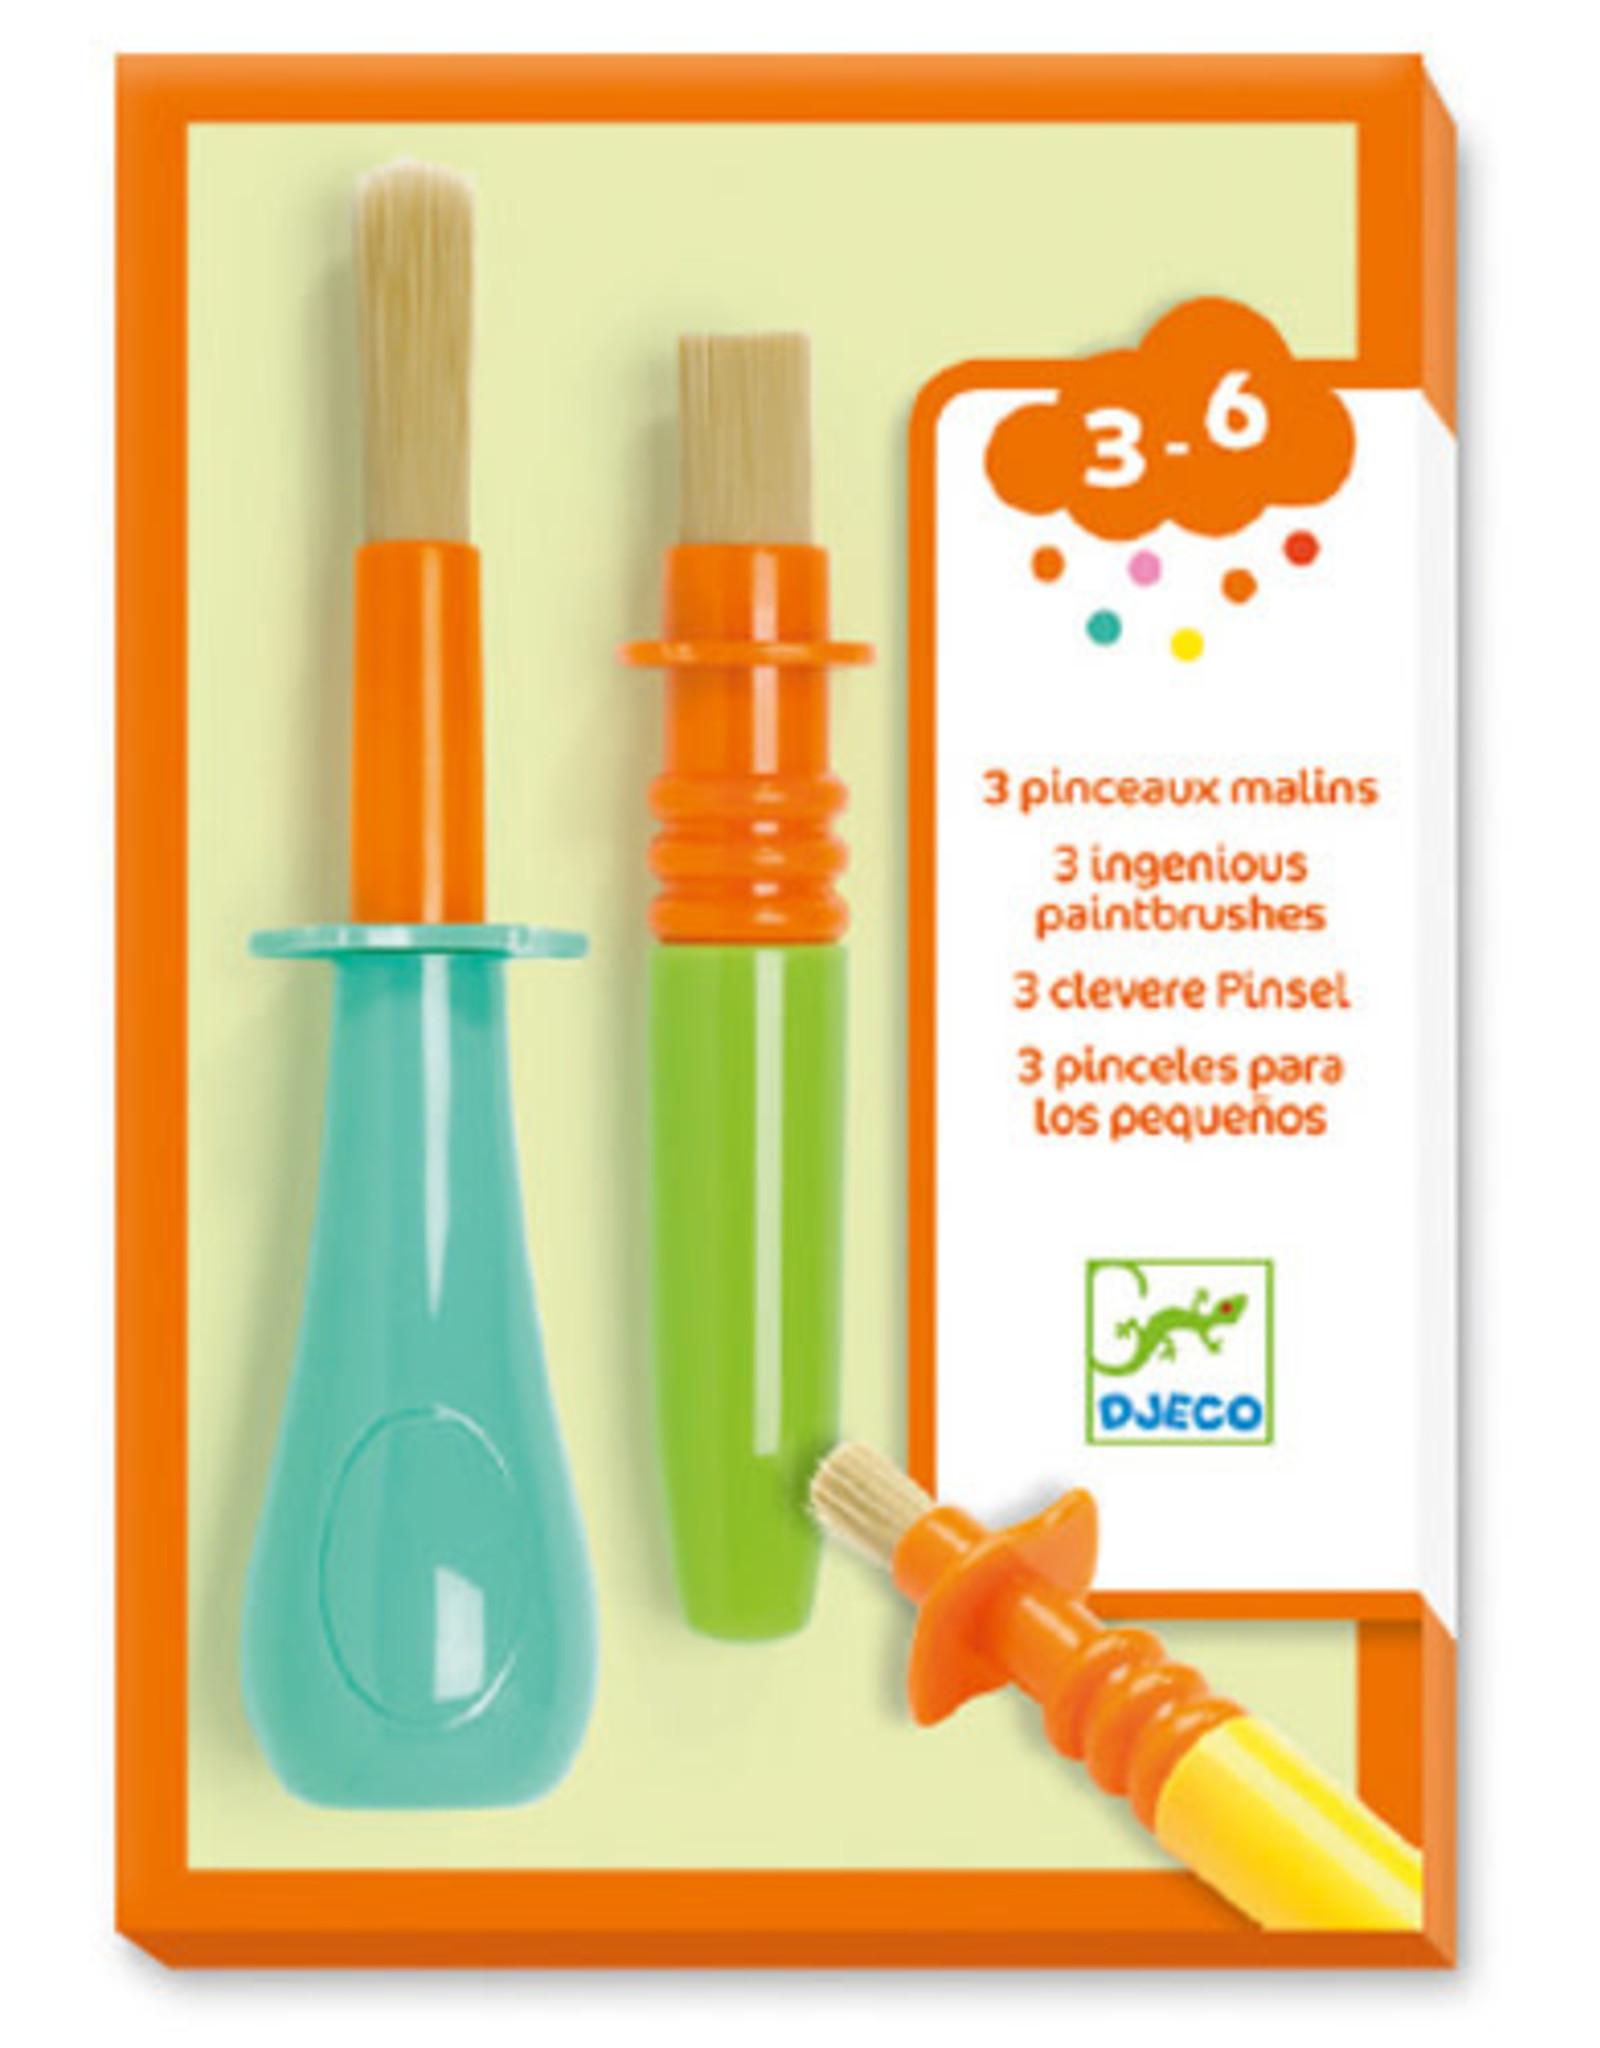 Djeco 3 Ingenious Paintbrushes